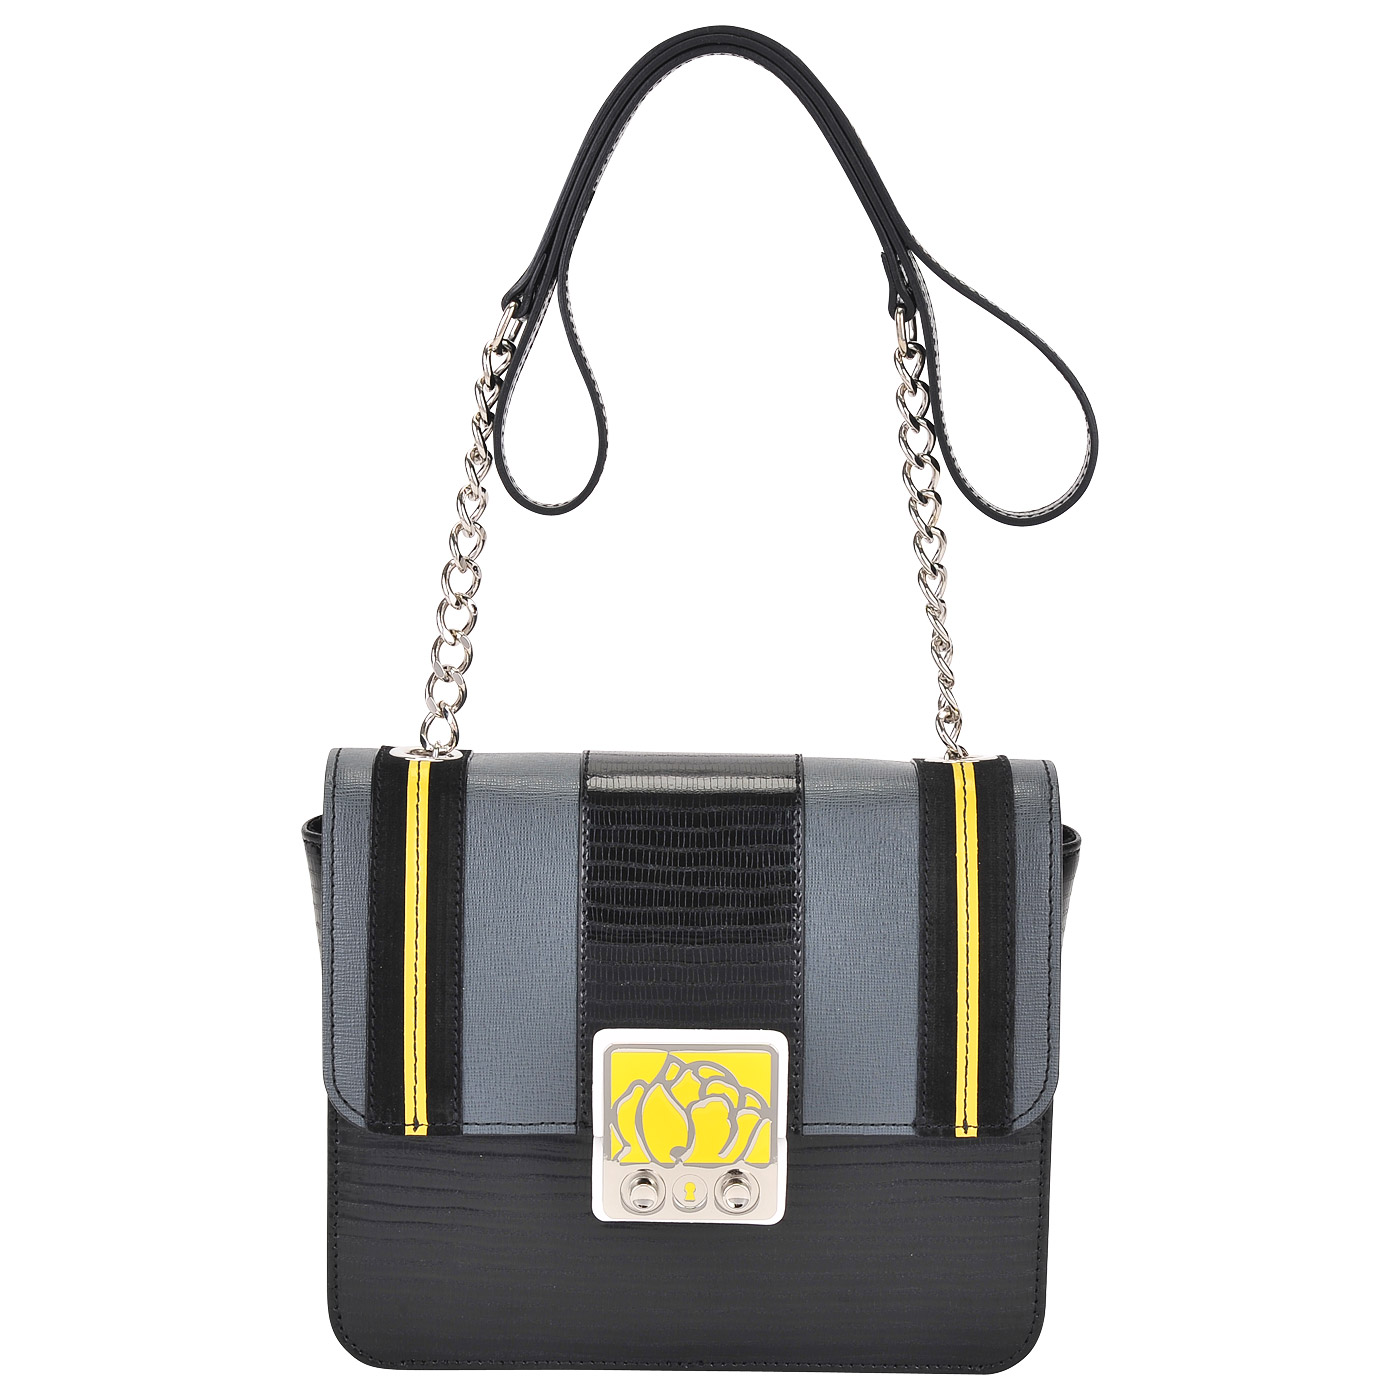 9b924c4cd95f Женская кожаная сумка через плечо Braccialini Carlotta Женская кожаная сумка  через плечо Braccialini Carlotta ...